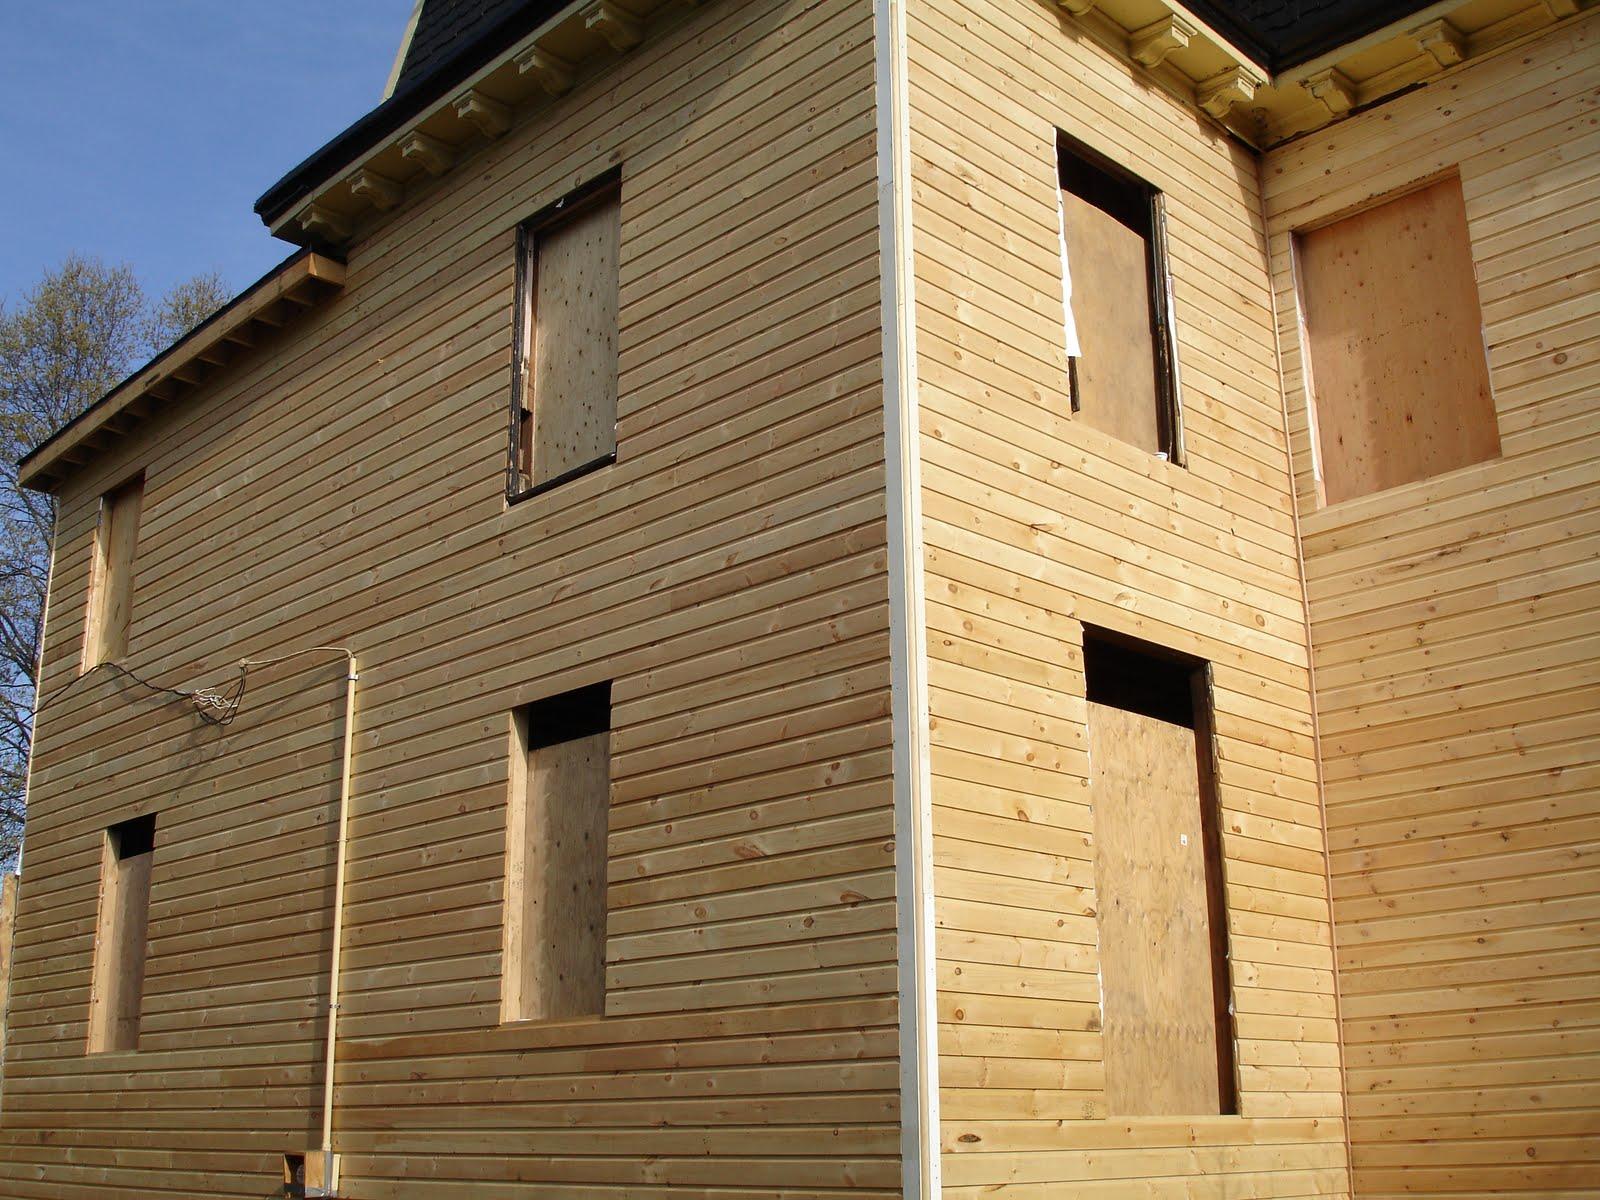 Renovate Restore Rebuild By Mta June 2011